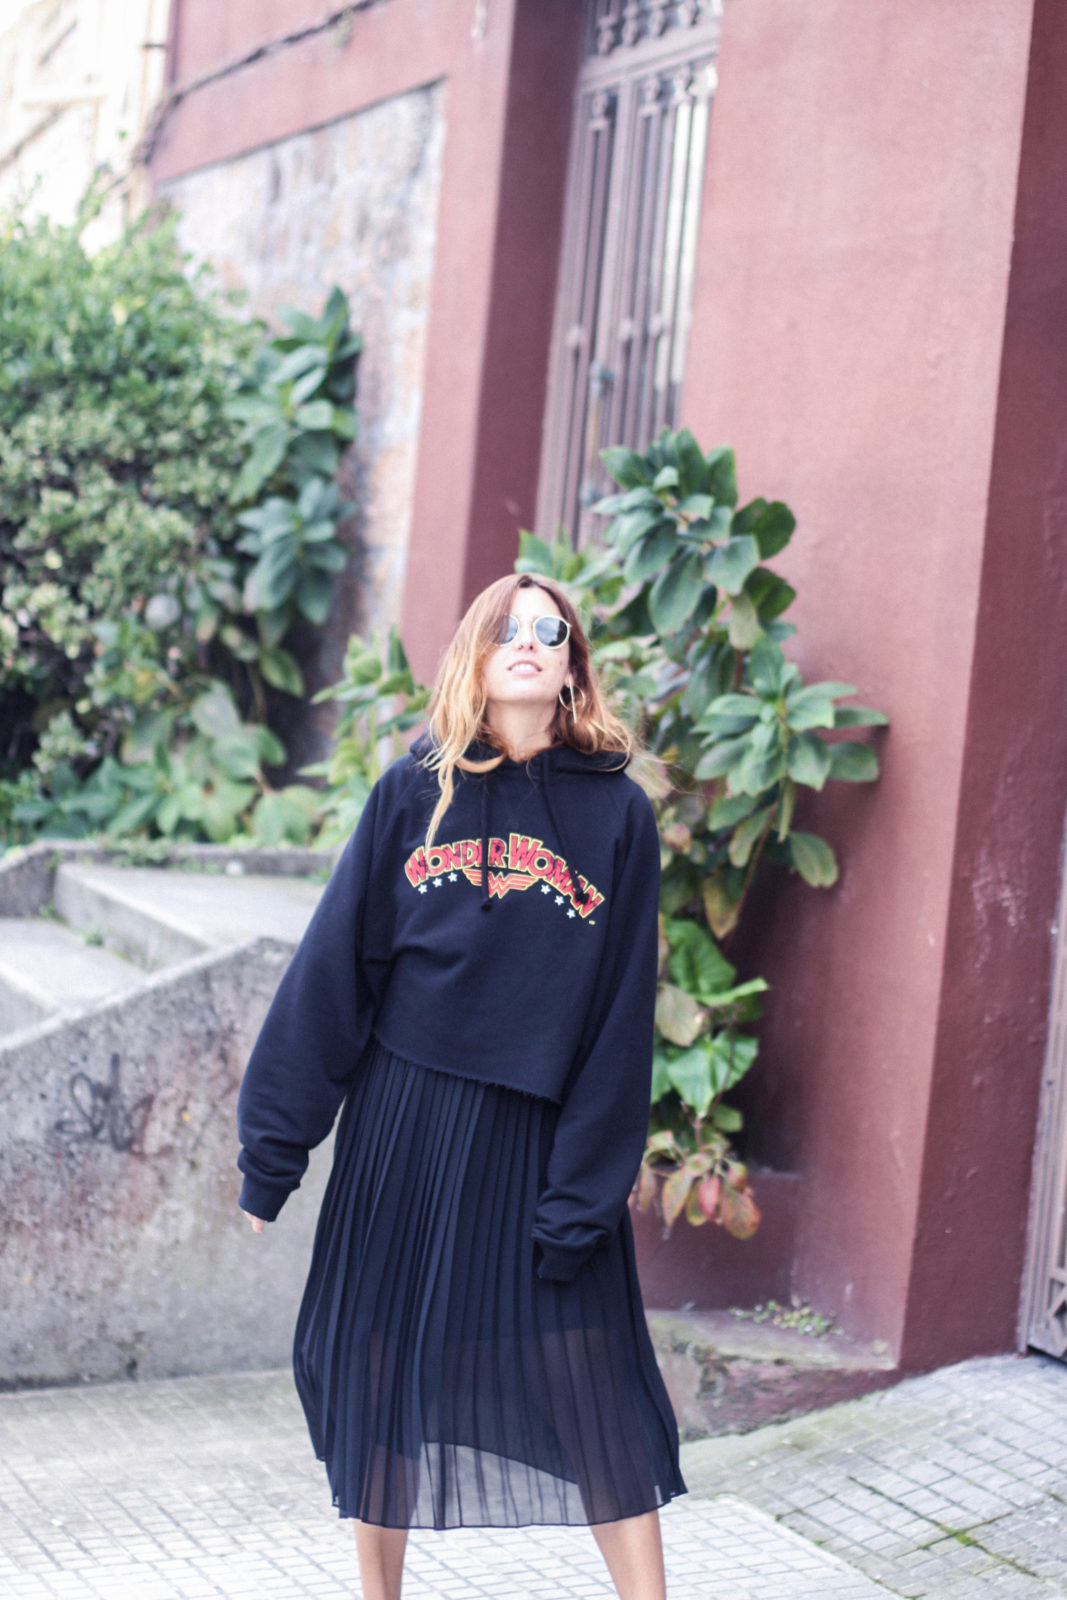 sudadera_wonder_woman_zara-24